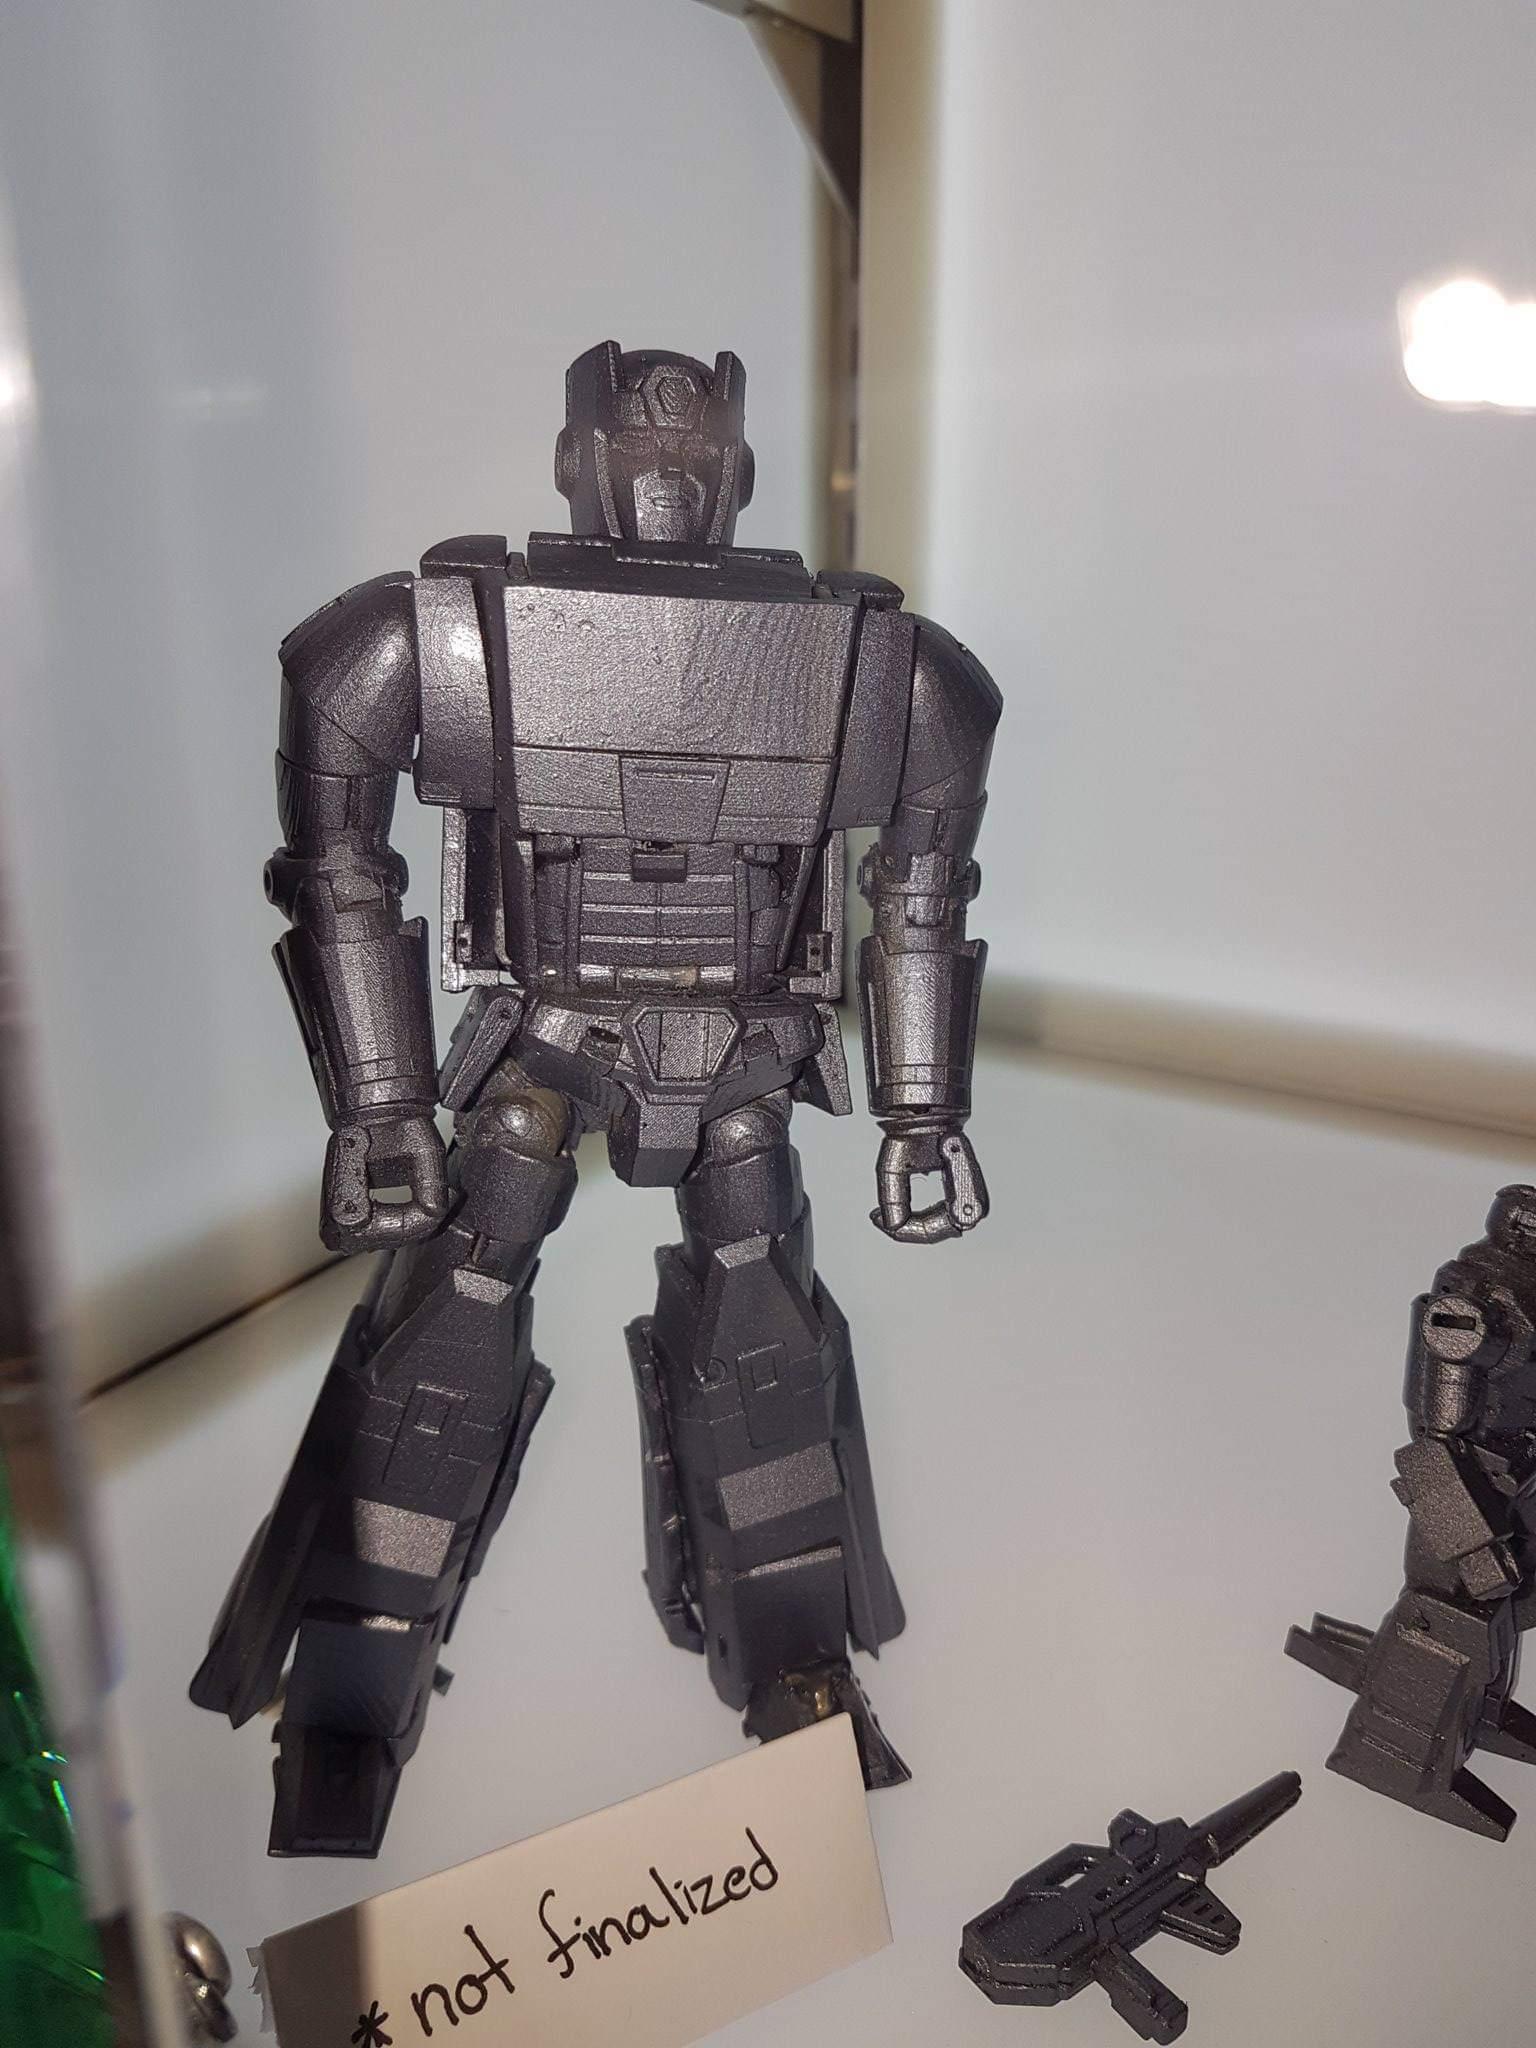 [X-Transbots] Produit Tiers - Jouets MX-?? Locke - aka Kup/Kaisso CcxMTxQA_o